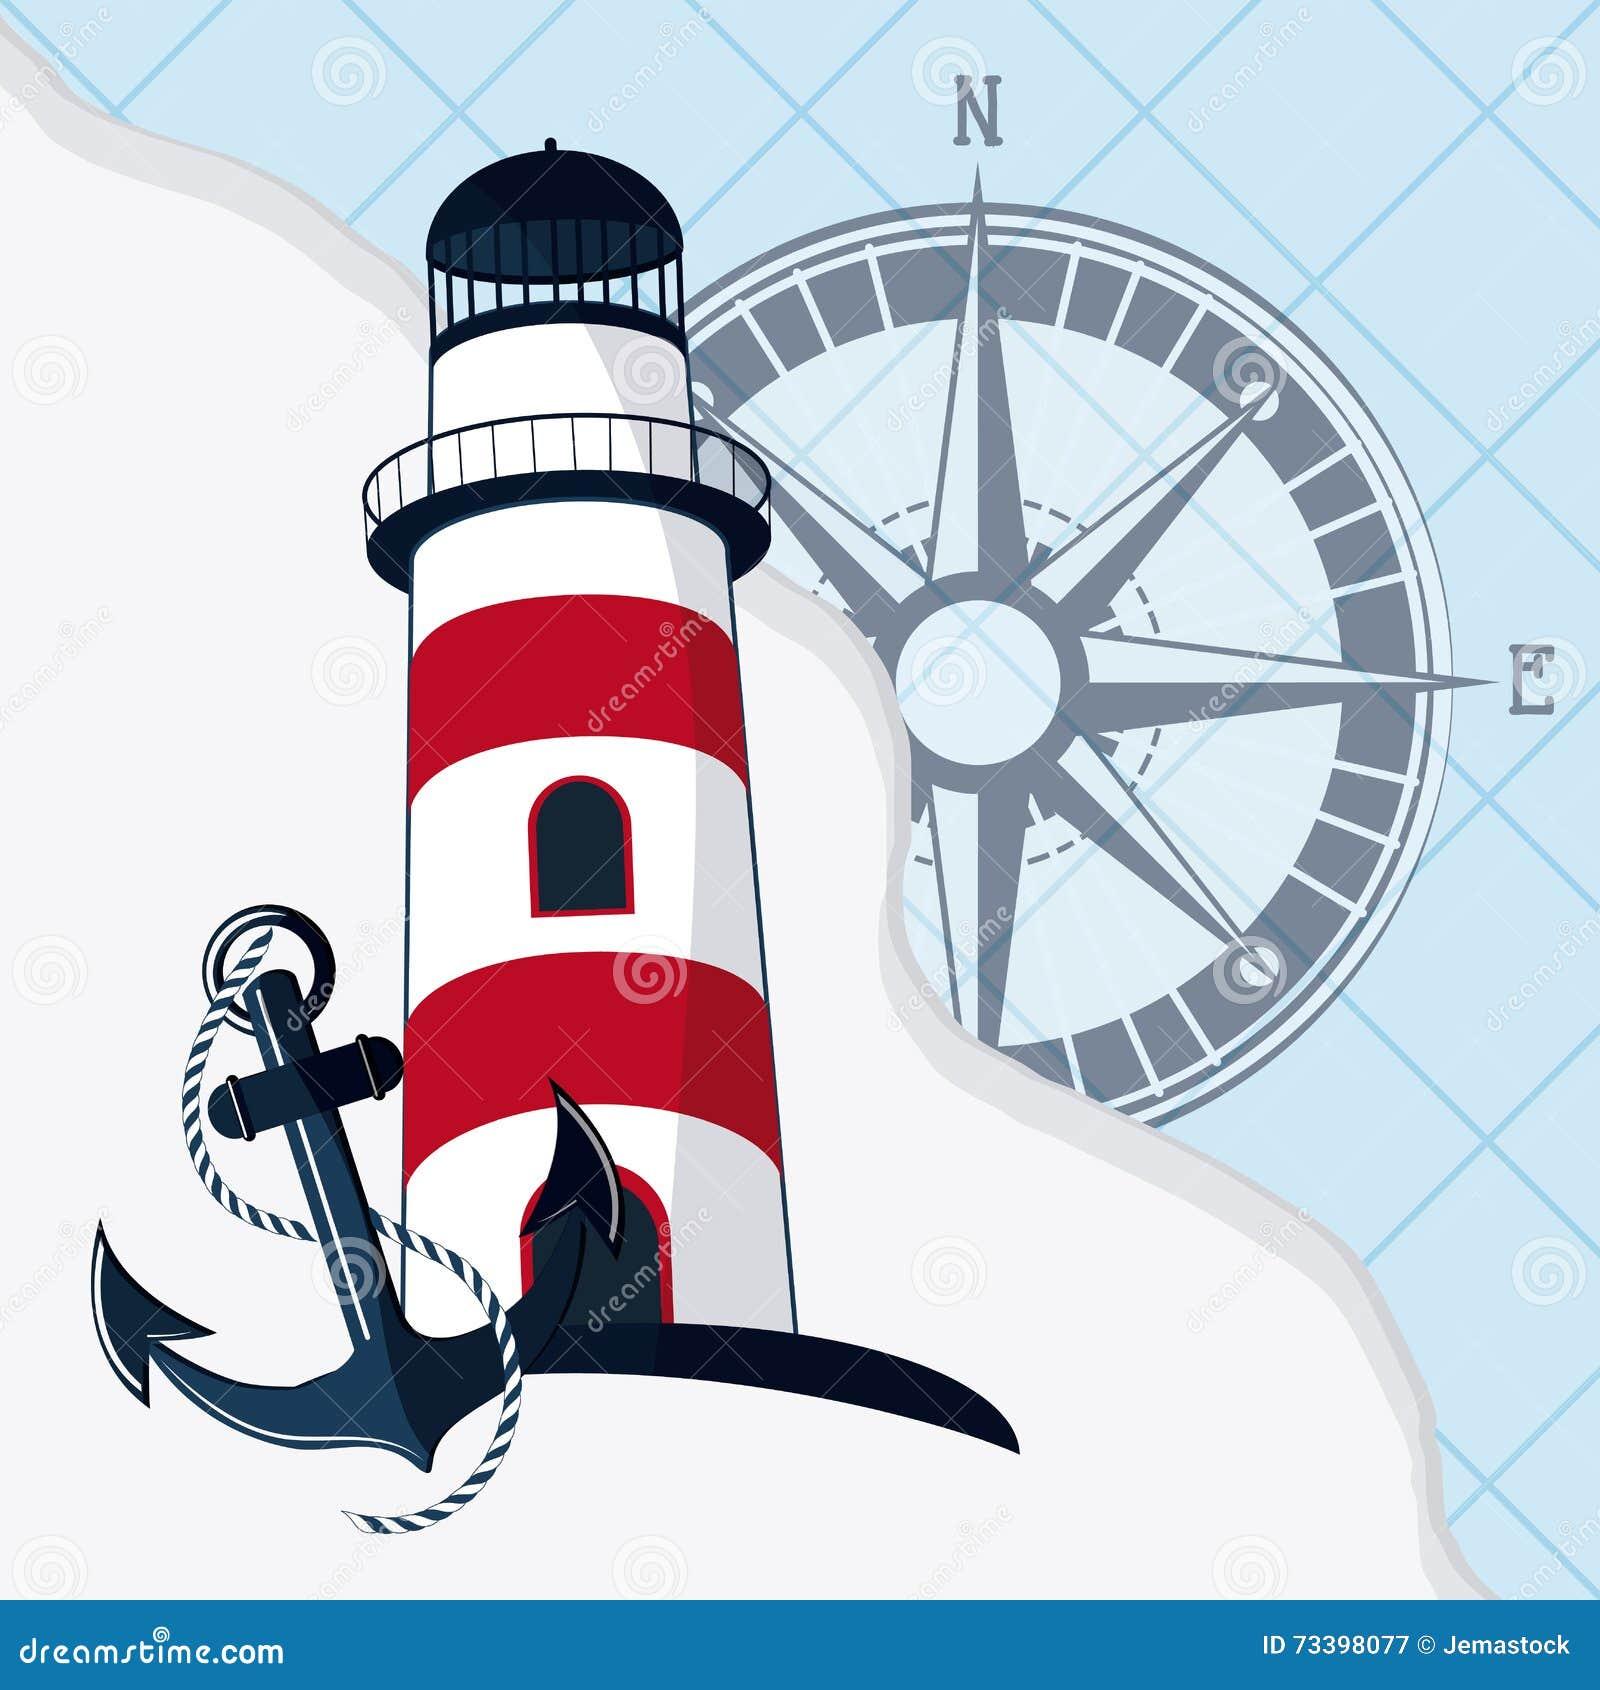 Sea Life Design, Nautical And Marine Concept, Illustration